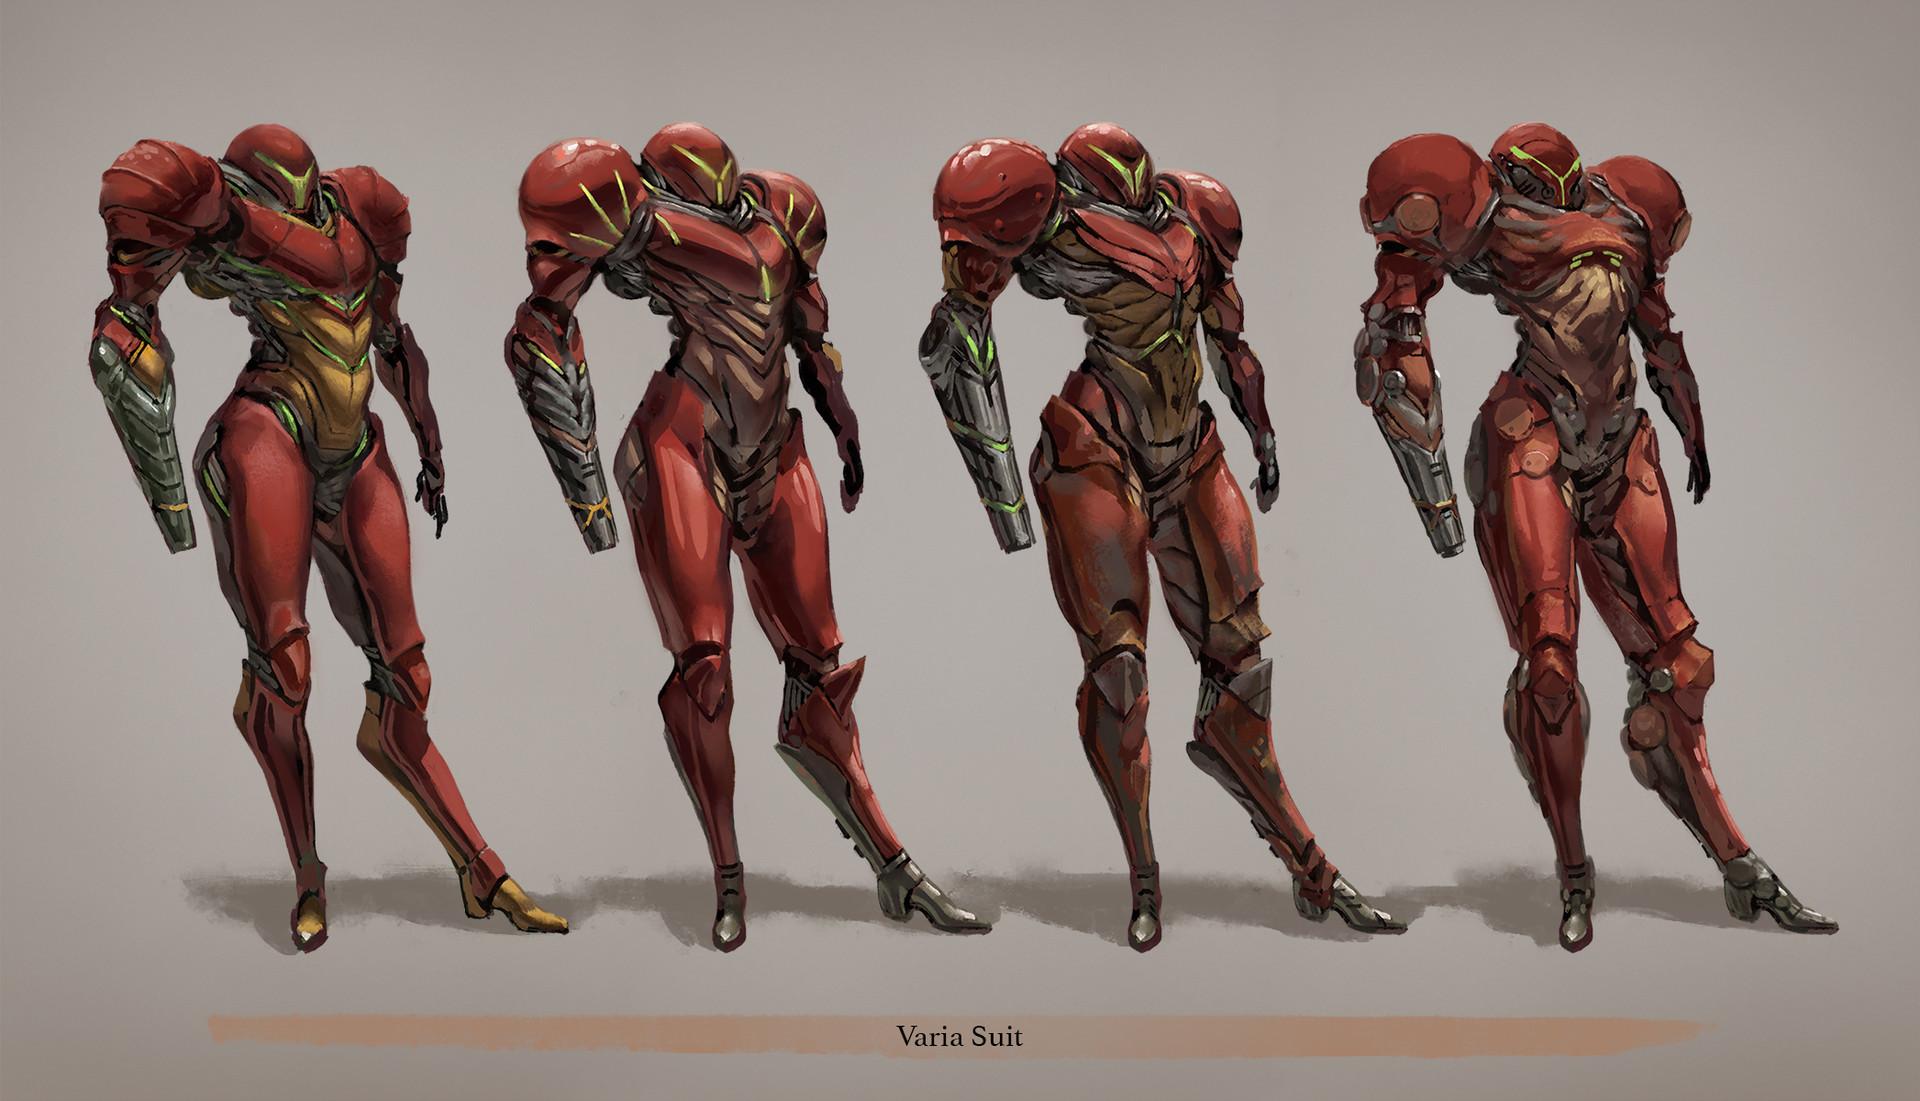 Armor Superhero Suit Concept Art